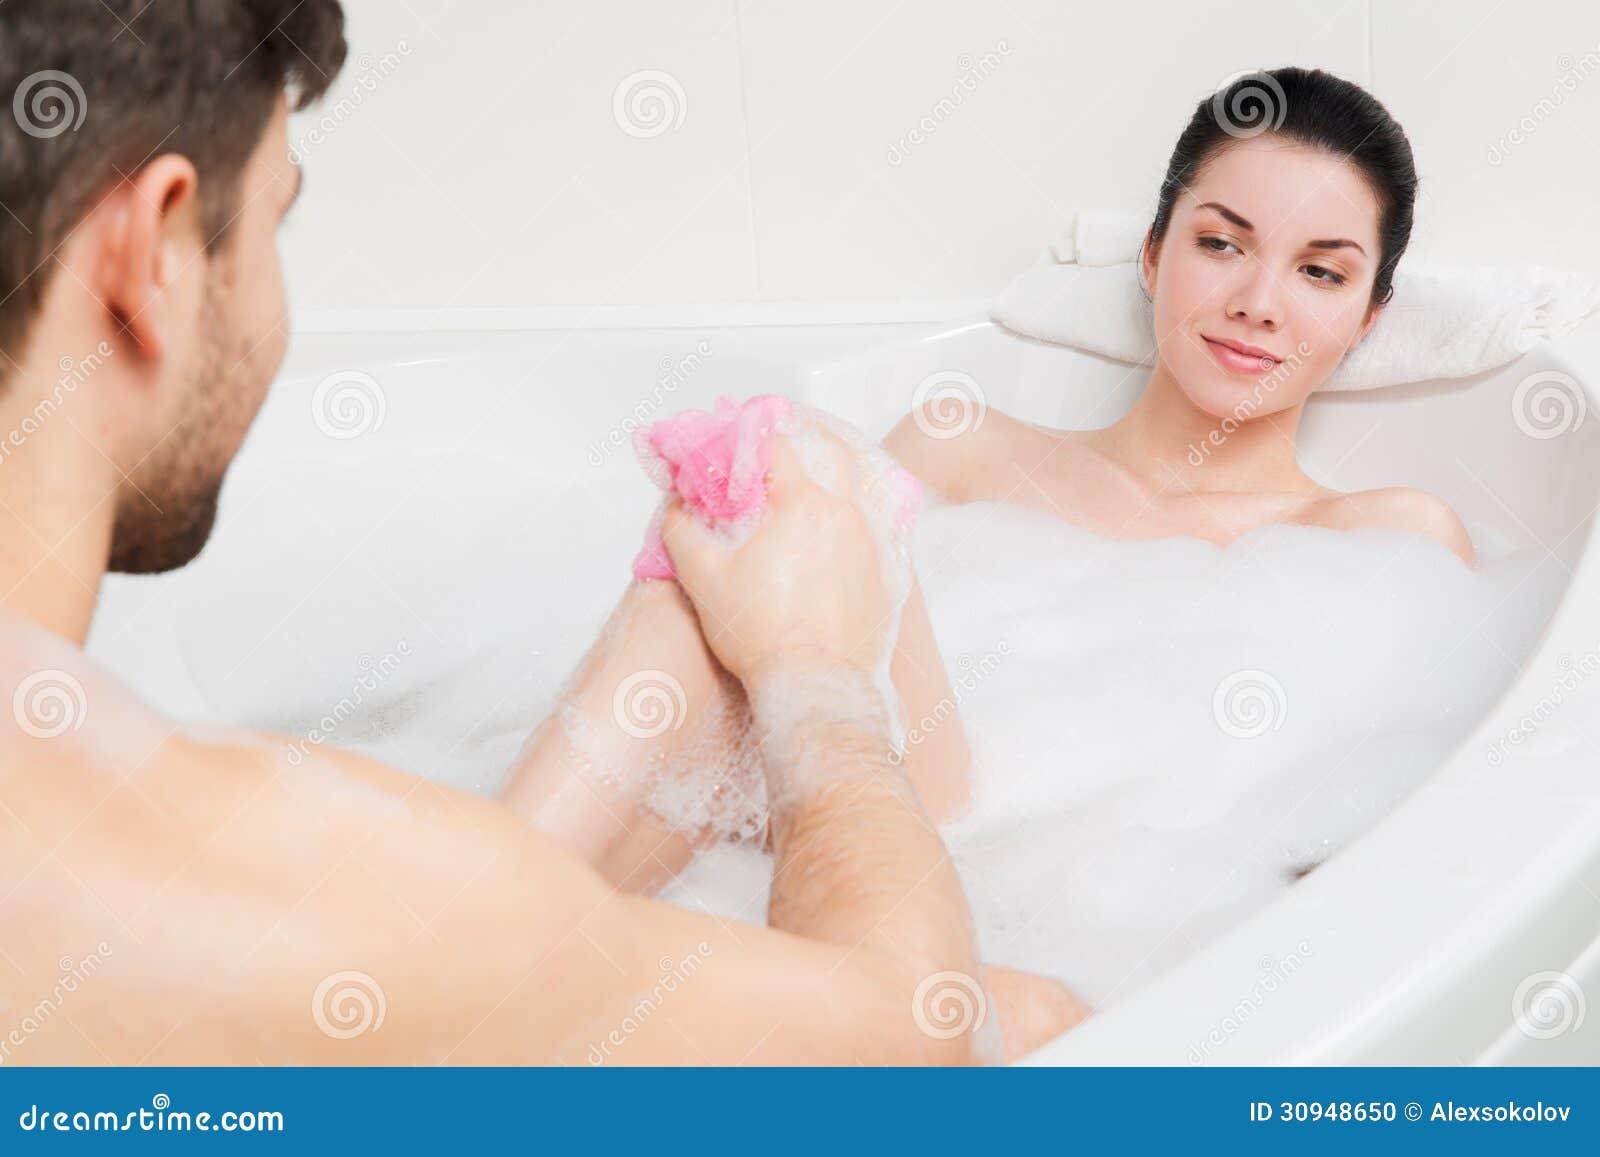 Парочка купается ванной фото, презерватив натягивает на член